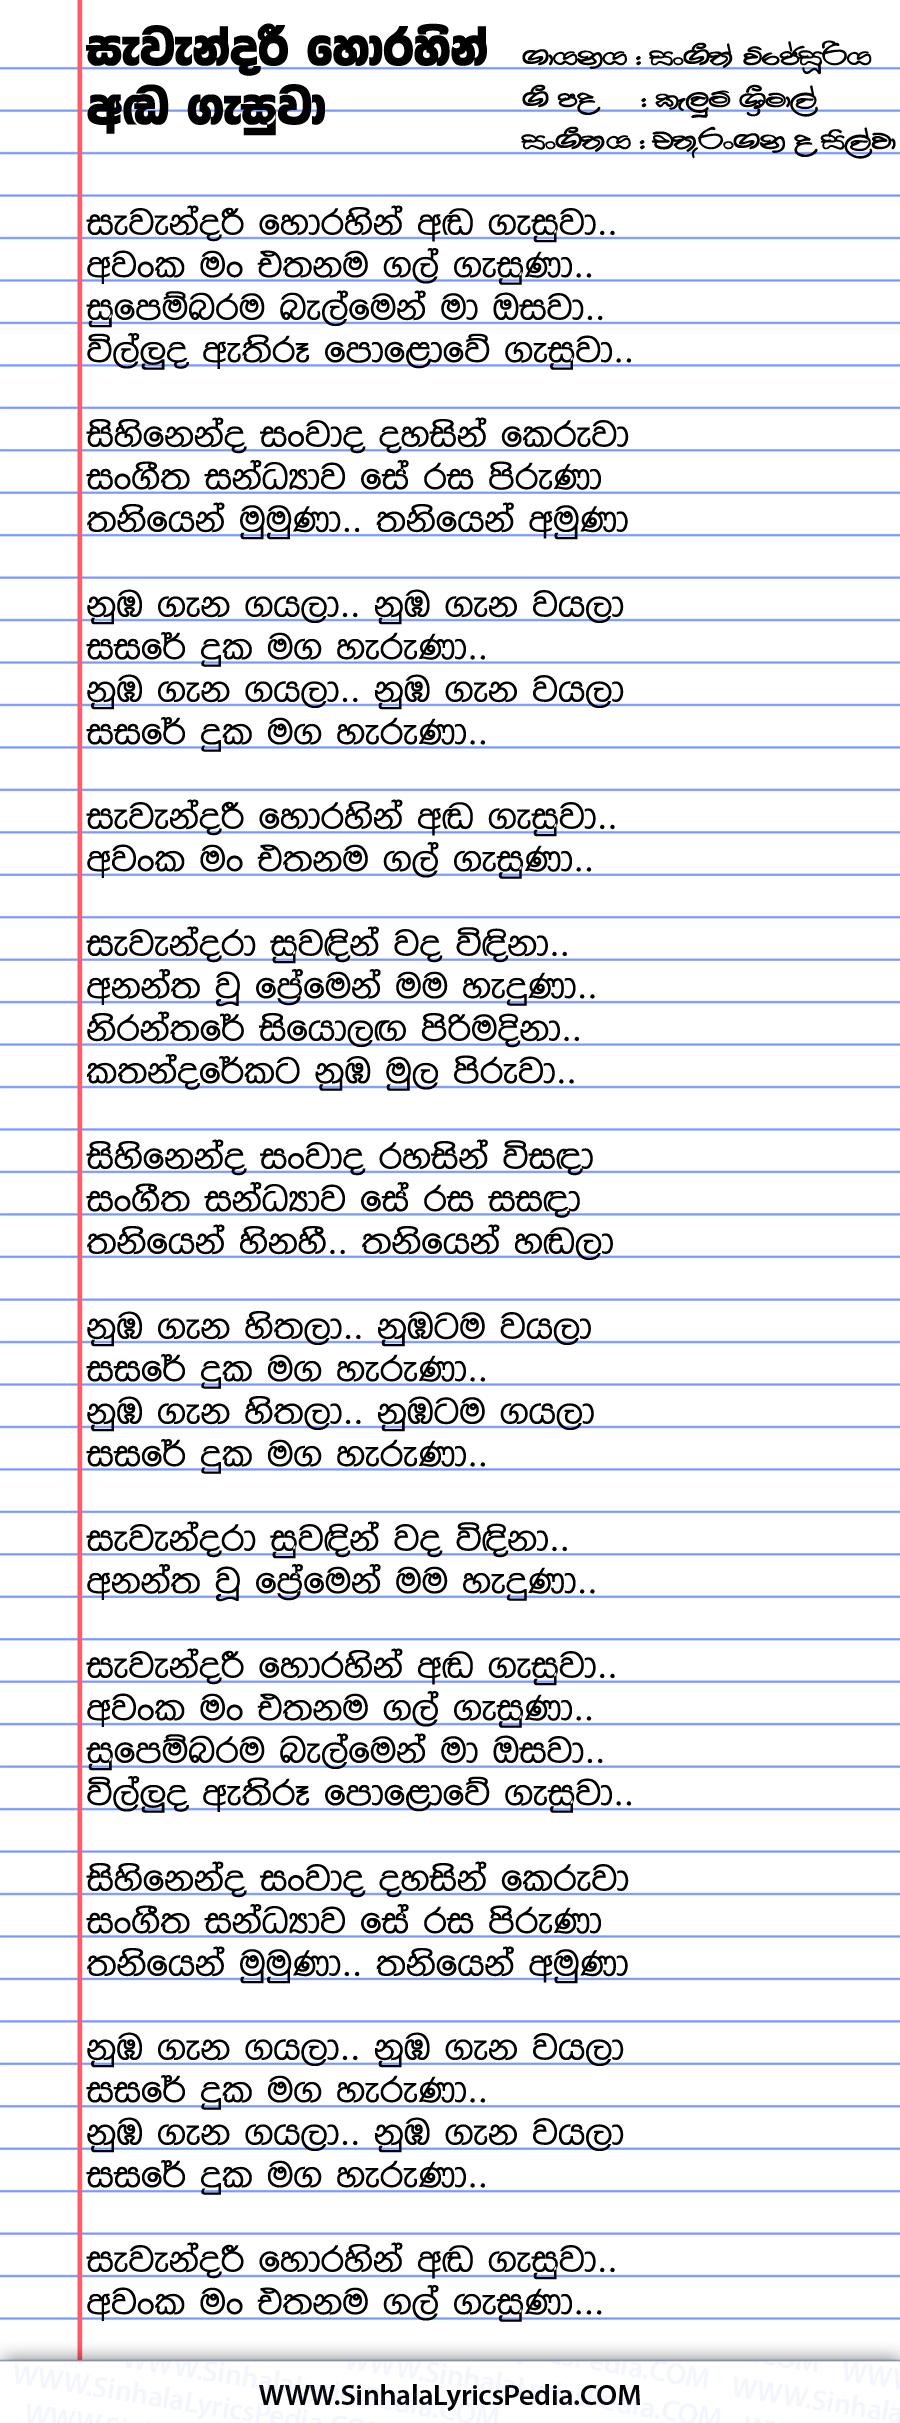 Sawandari Horahin Andagasuwa Song Lyrics